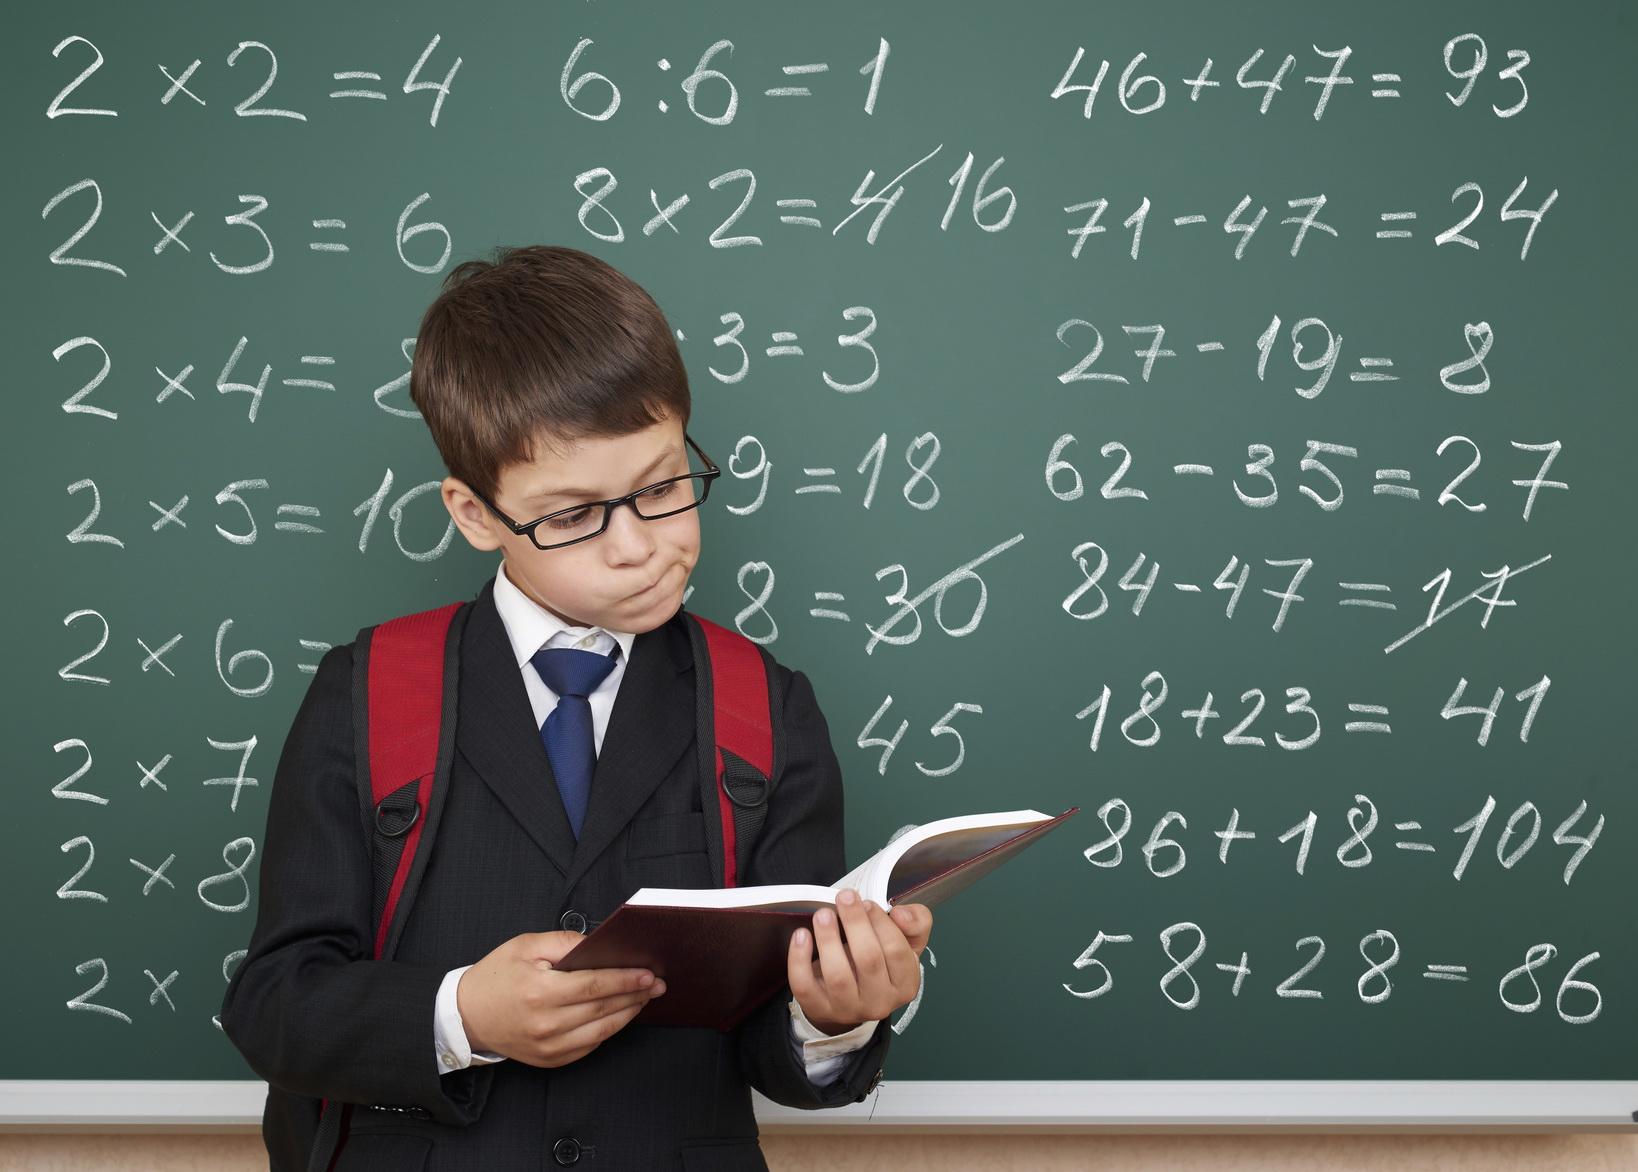 boy exercise math on school board